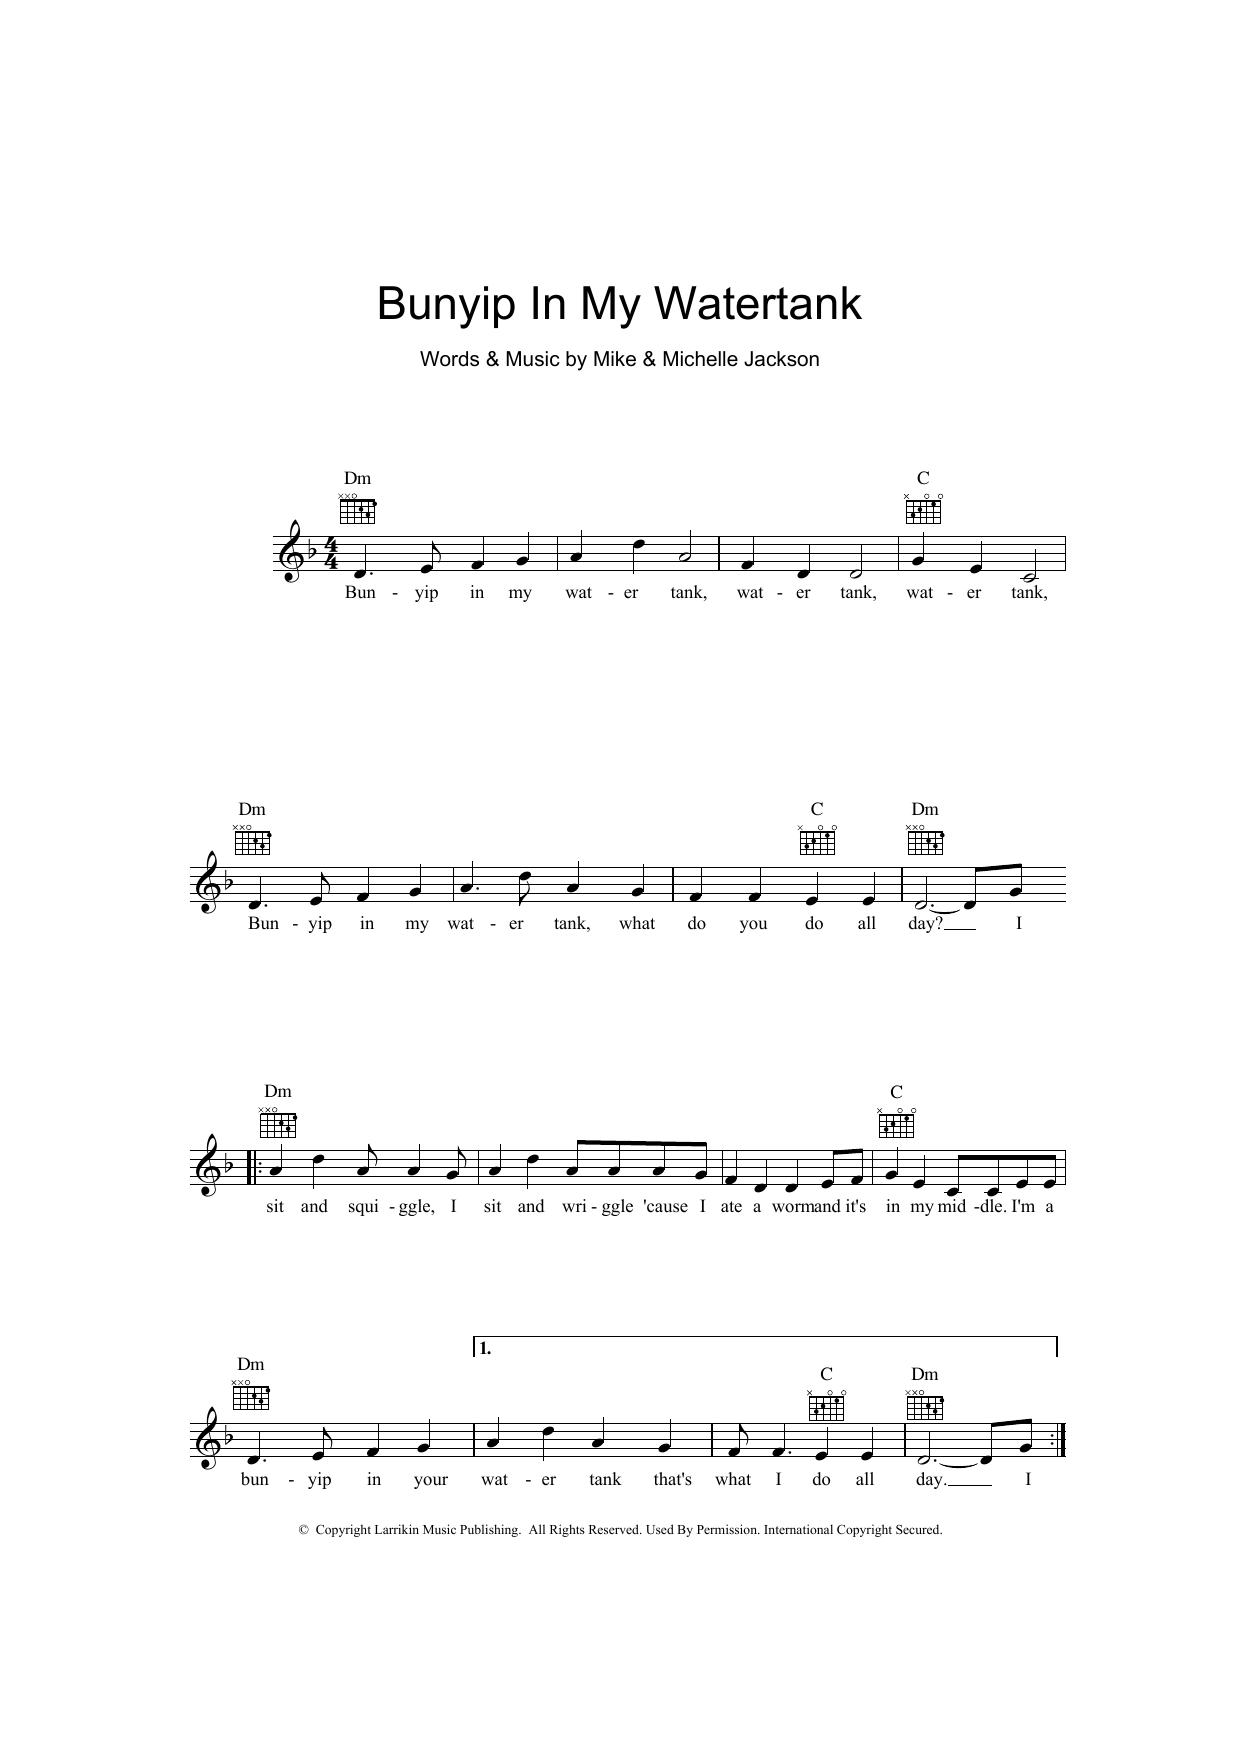 Bunyip In My Water Tank Sheet Music